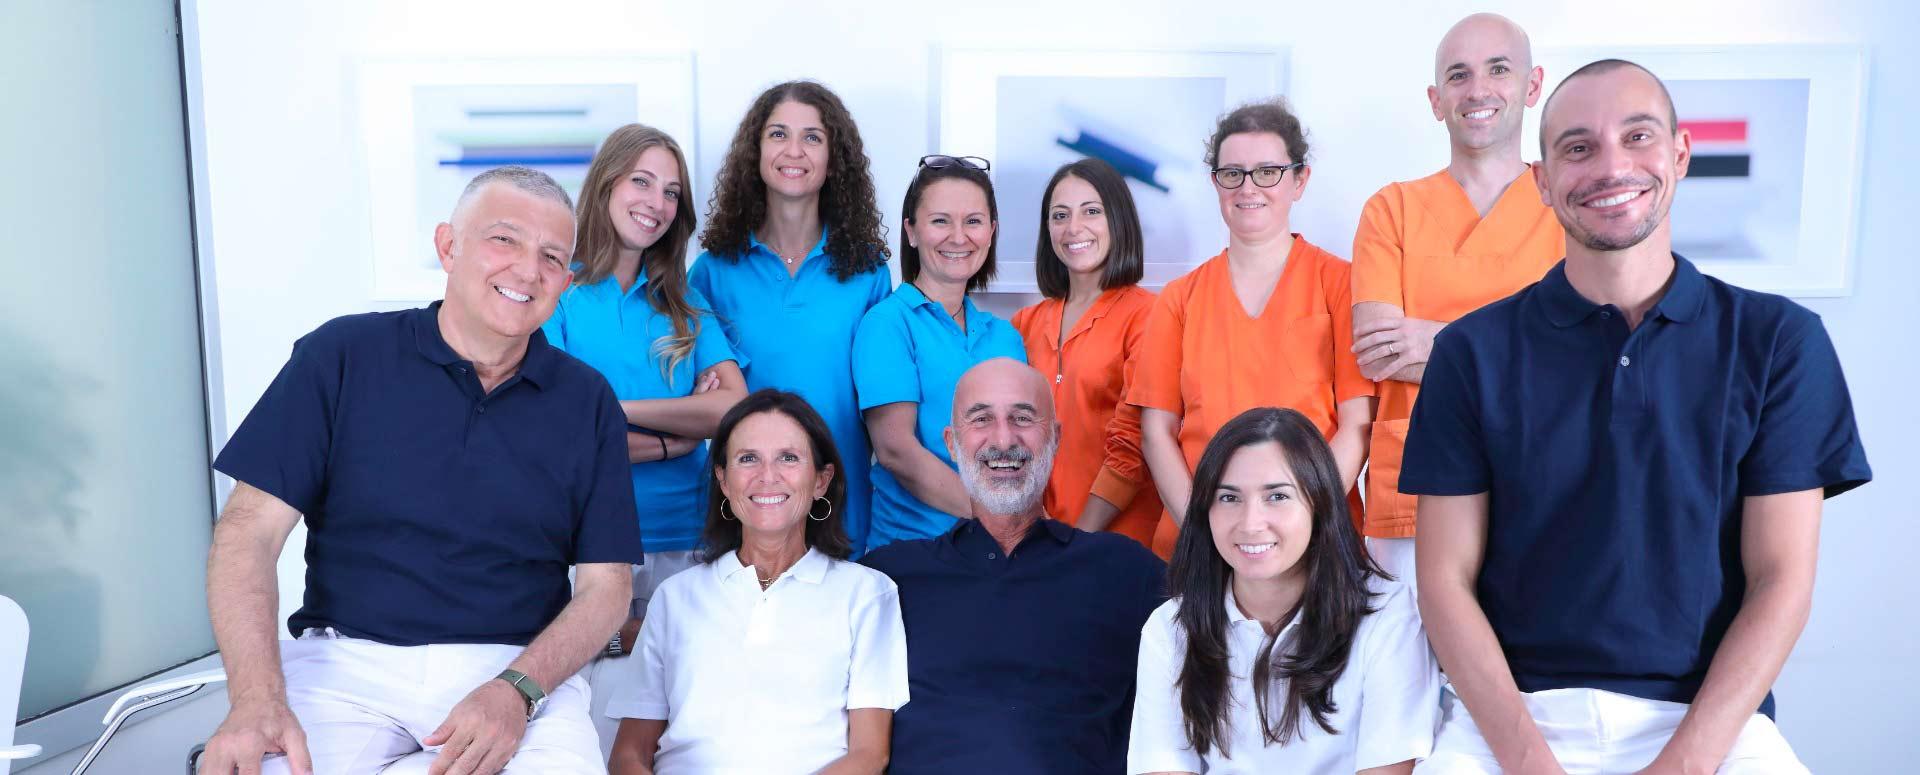 Poggiolini Boldrini Studio Odontoiatrico | Home